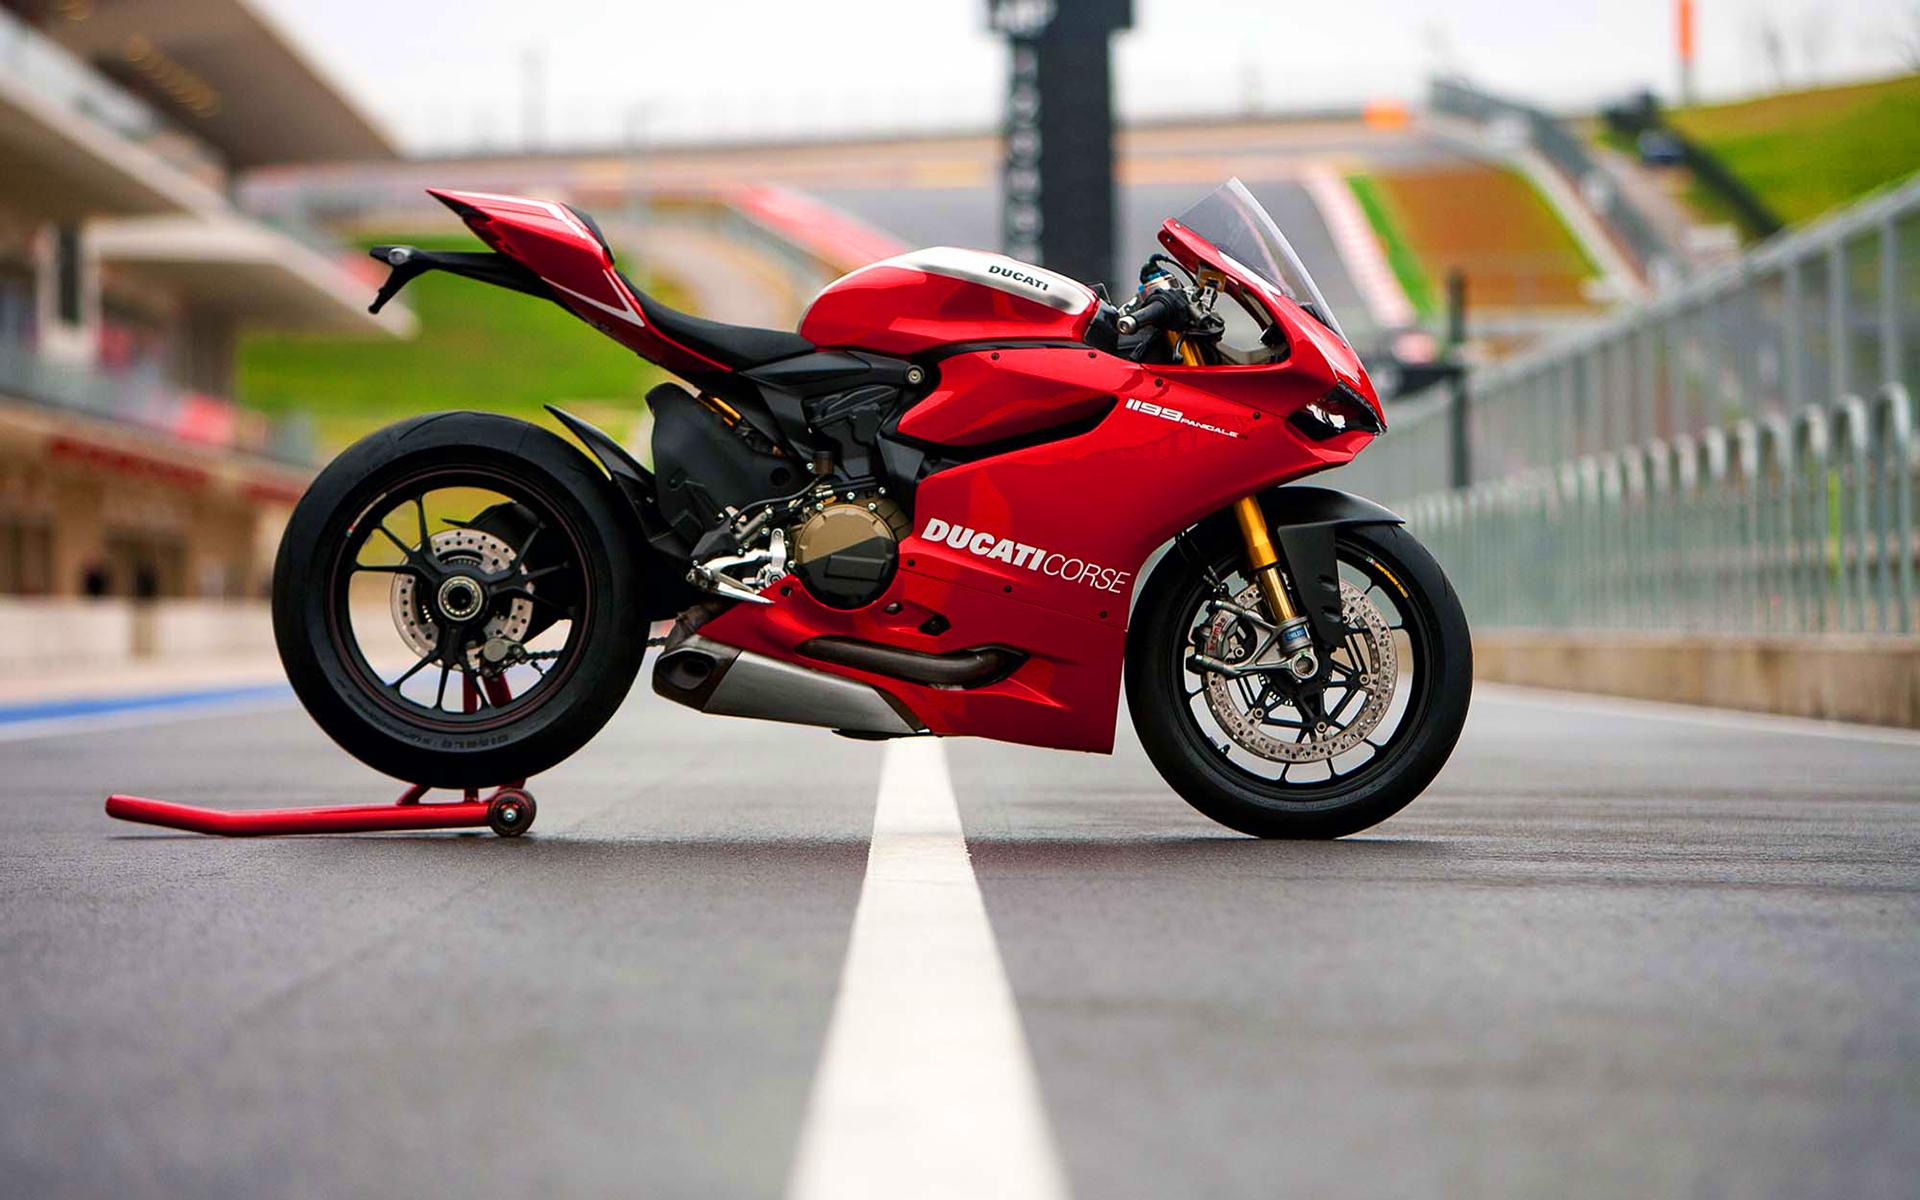 Ducati Wallpapers HD 1920x1200